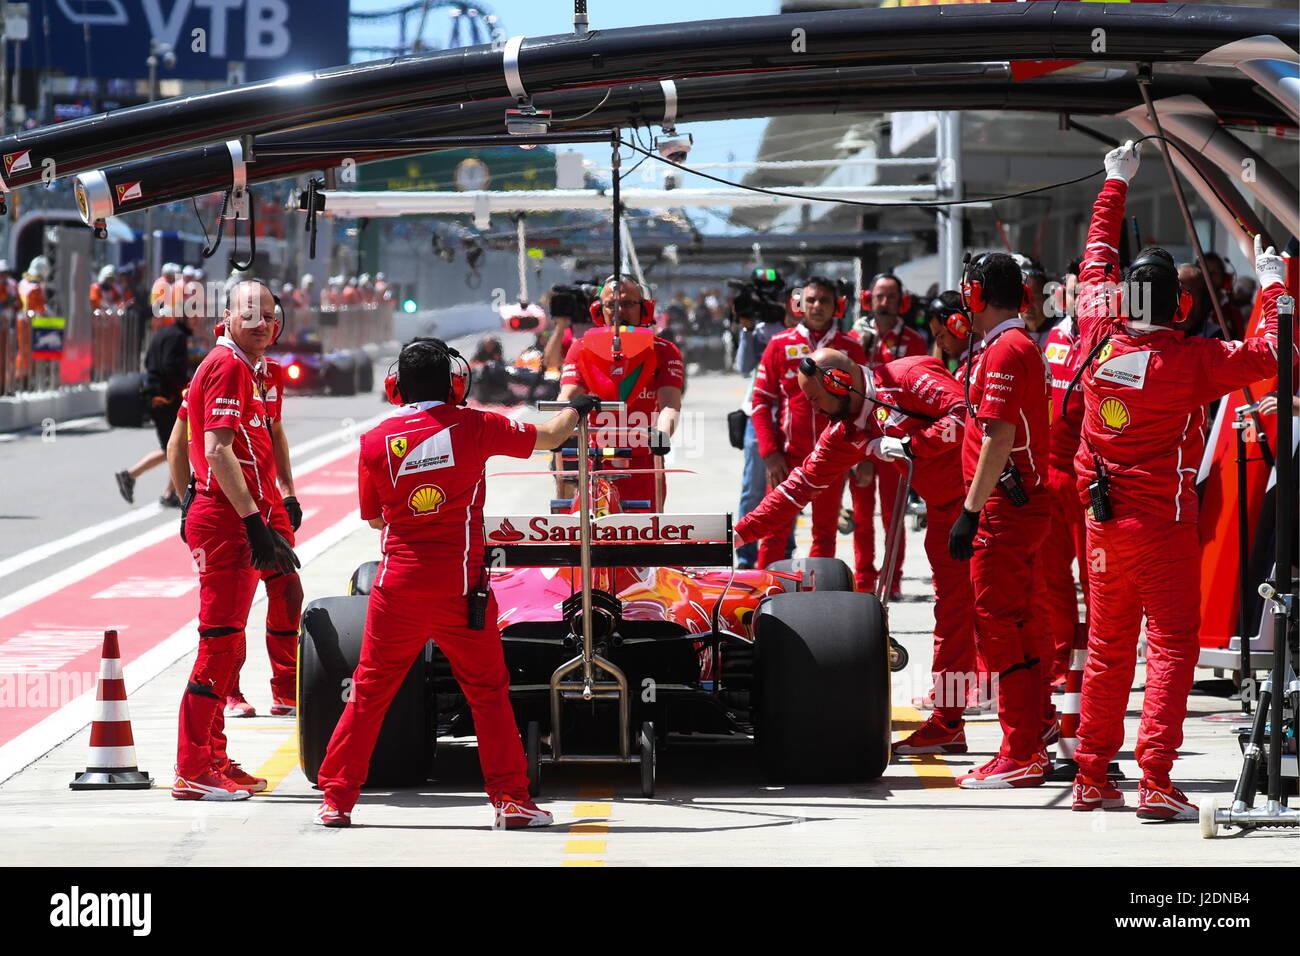 Sochi, Rusia. 28 abr, 2017. La Scuderia Ferrari F1 Team mecánica visto durante una sesión de práctica Imagen De Stock